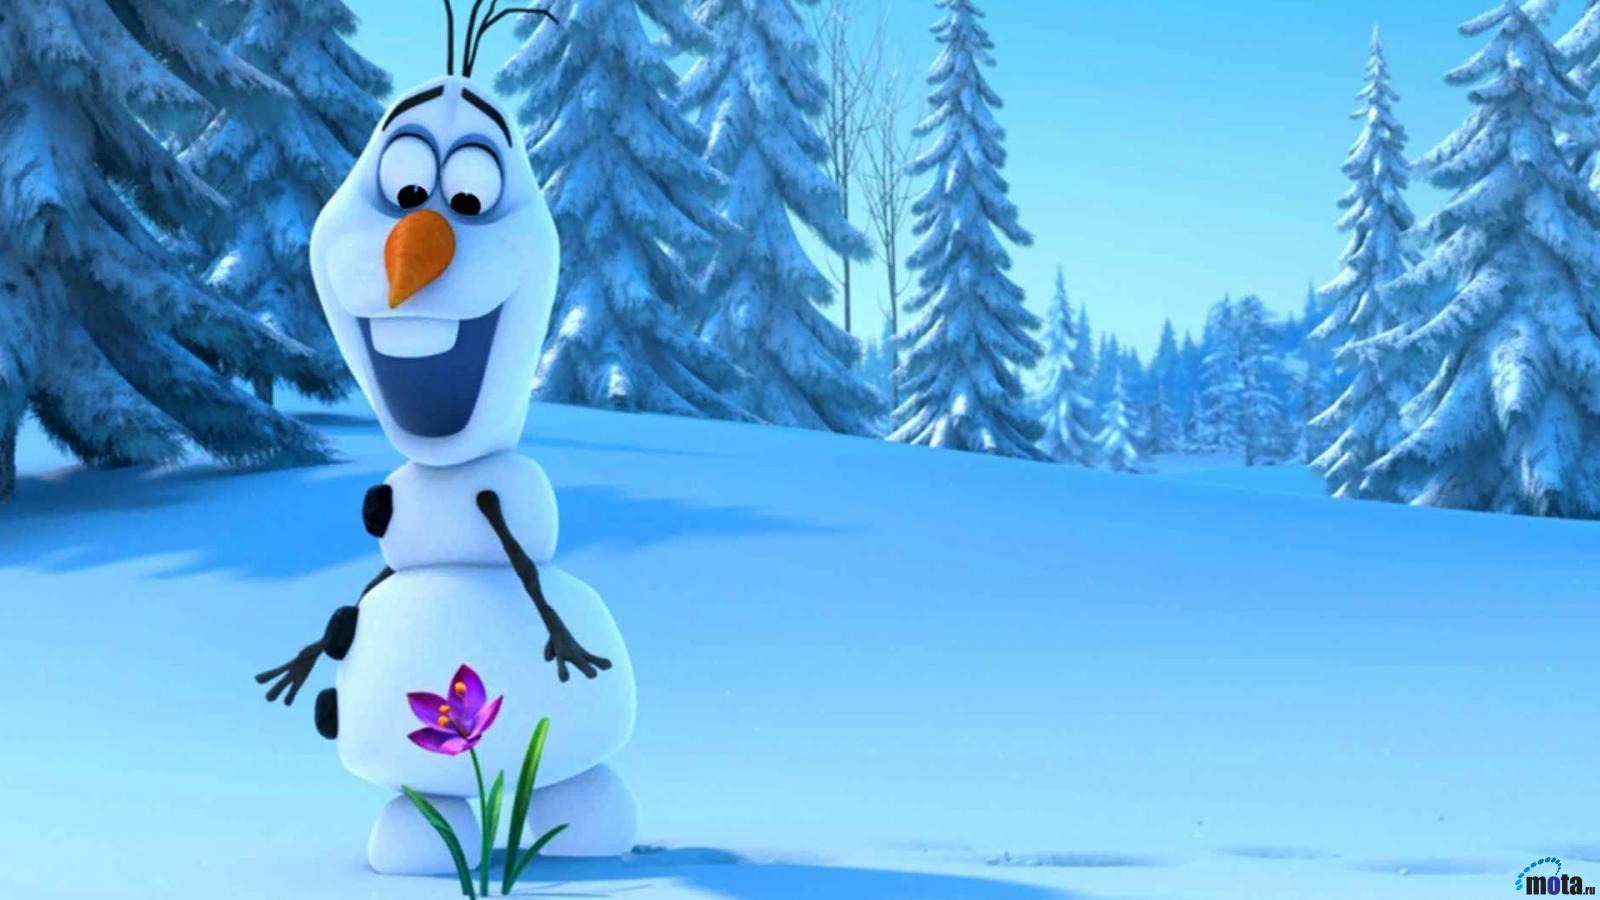 Wallpaper Olaf and snowdrop   Frozen 1600 x 900 widescreen Desktop 1600x900